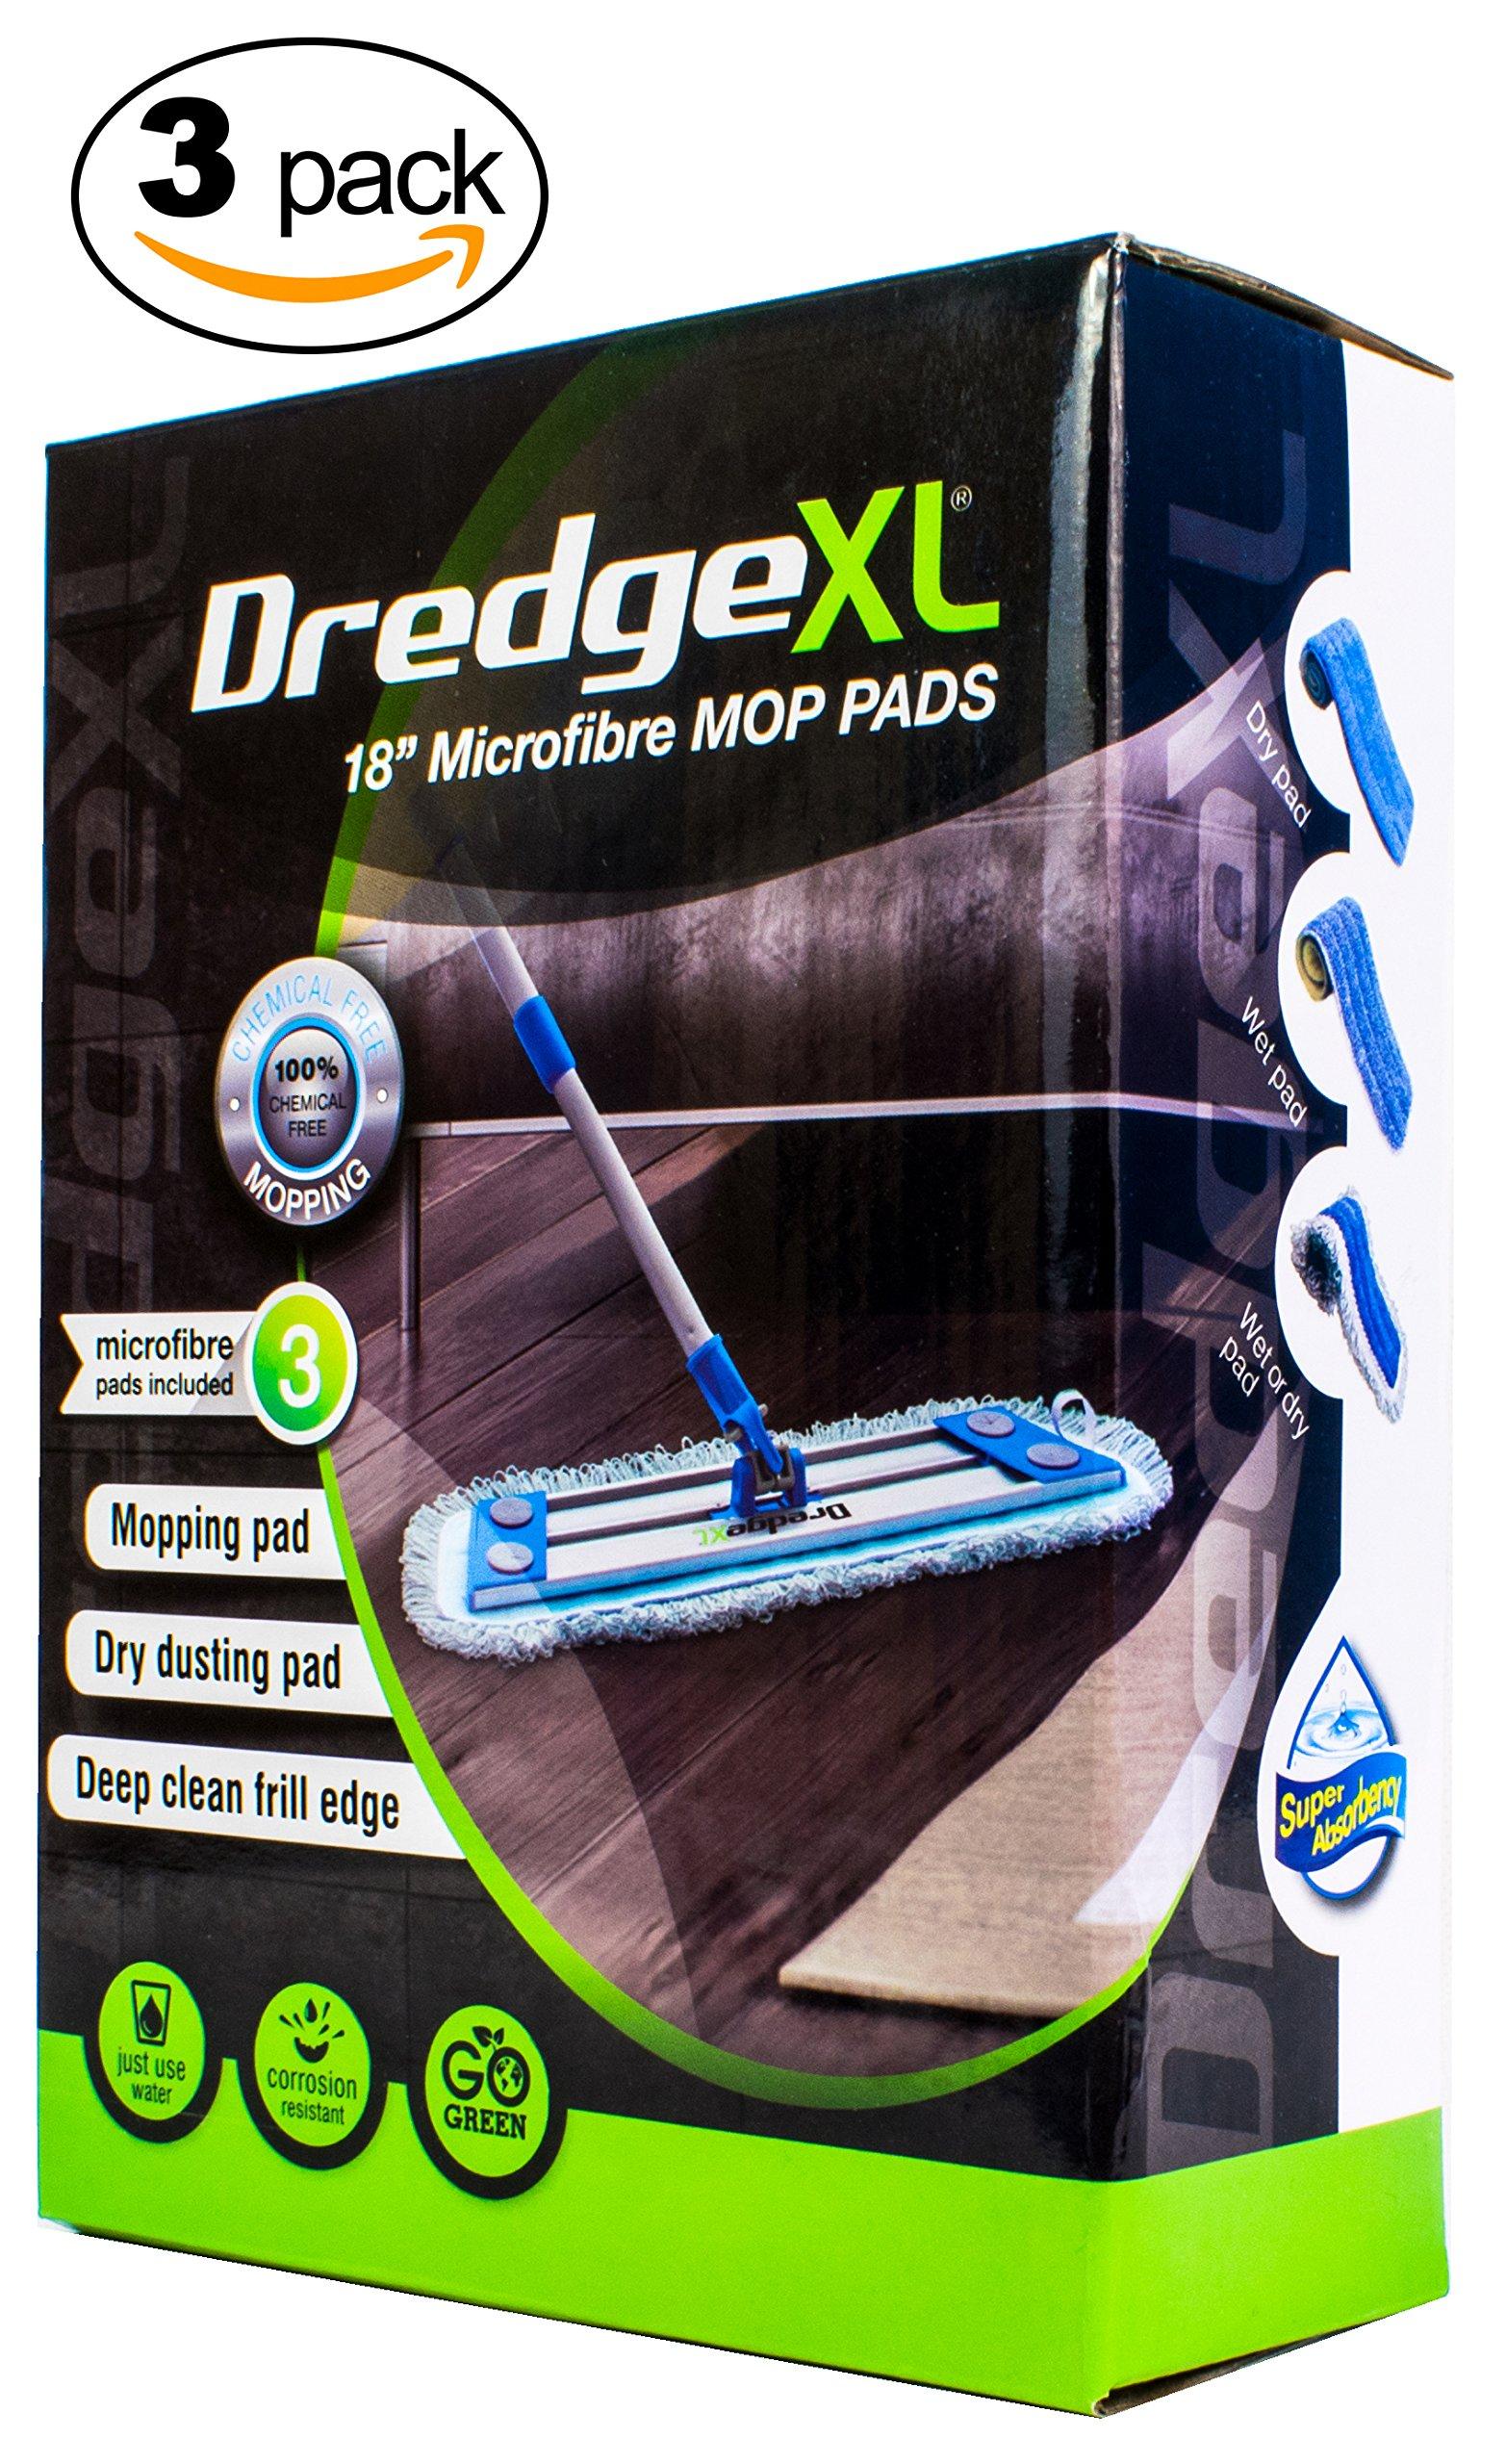 Temples Pride Professional 18'' DREDGE XL Microfiber flat mop replacement pads | Suits hardwood Tile Laminate Linoleum & Vinyl floor - 3 Pack